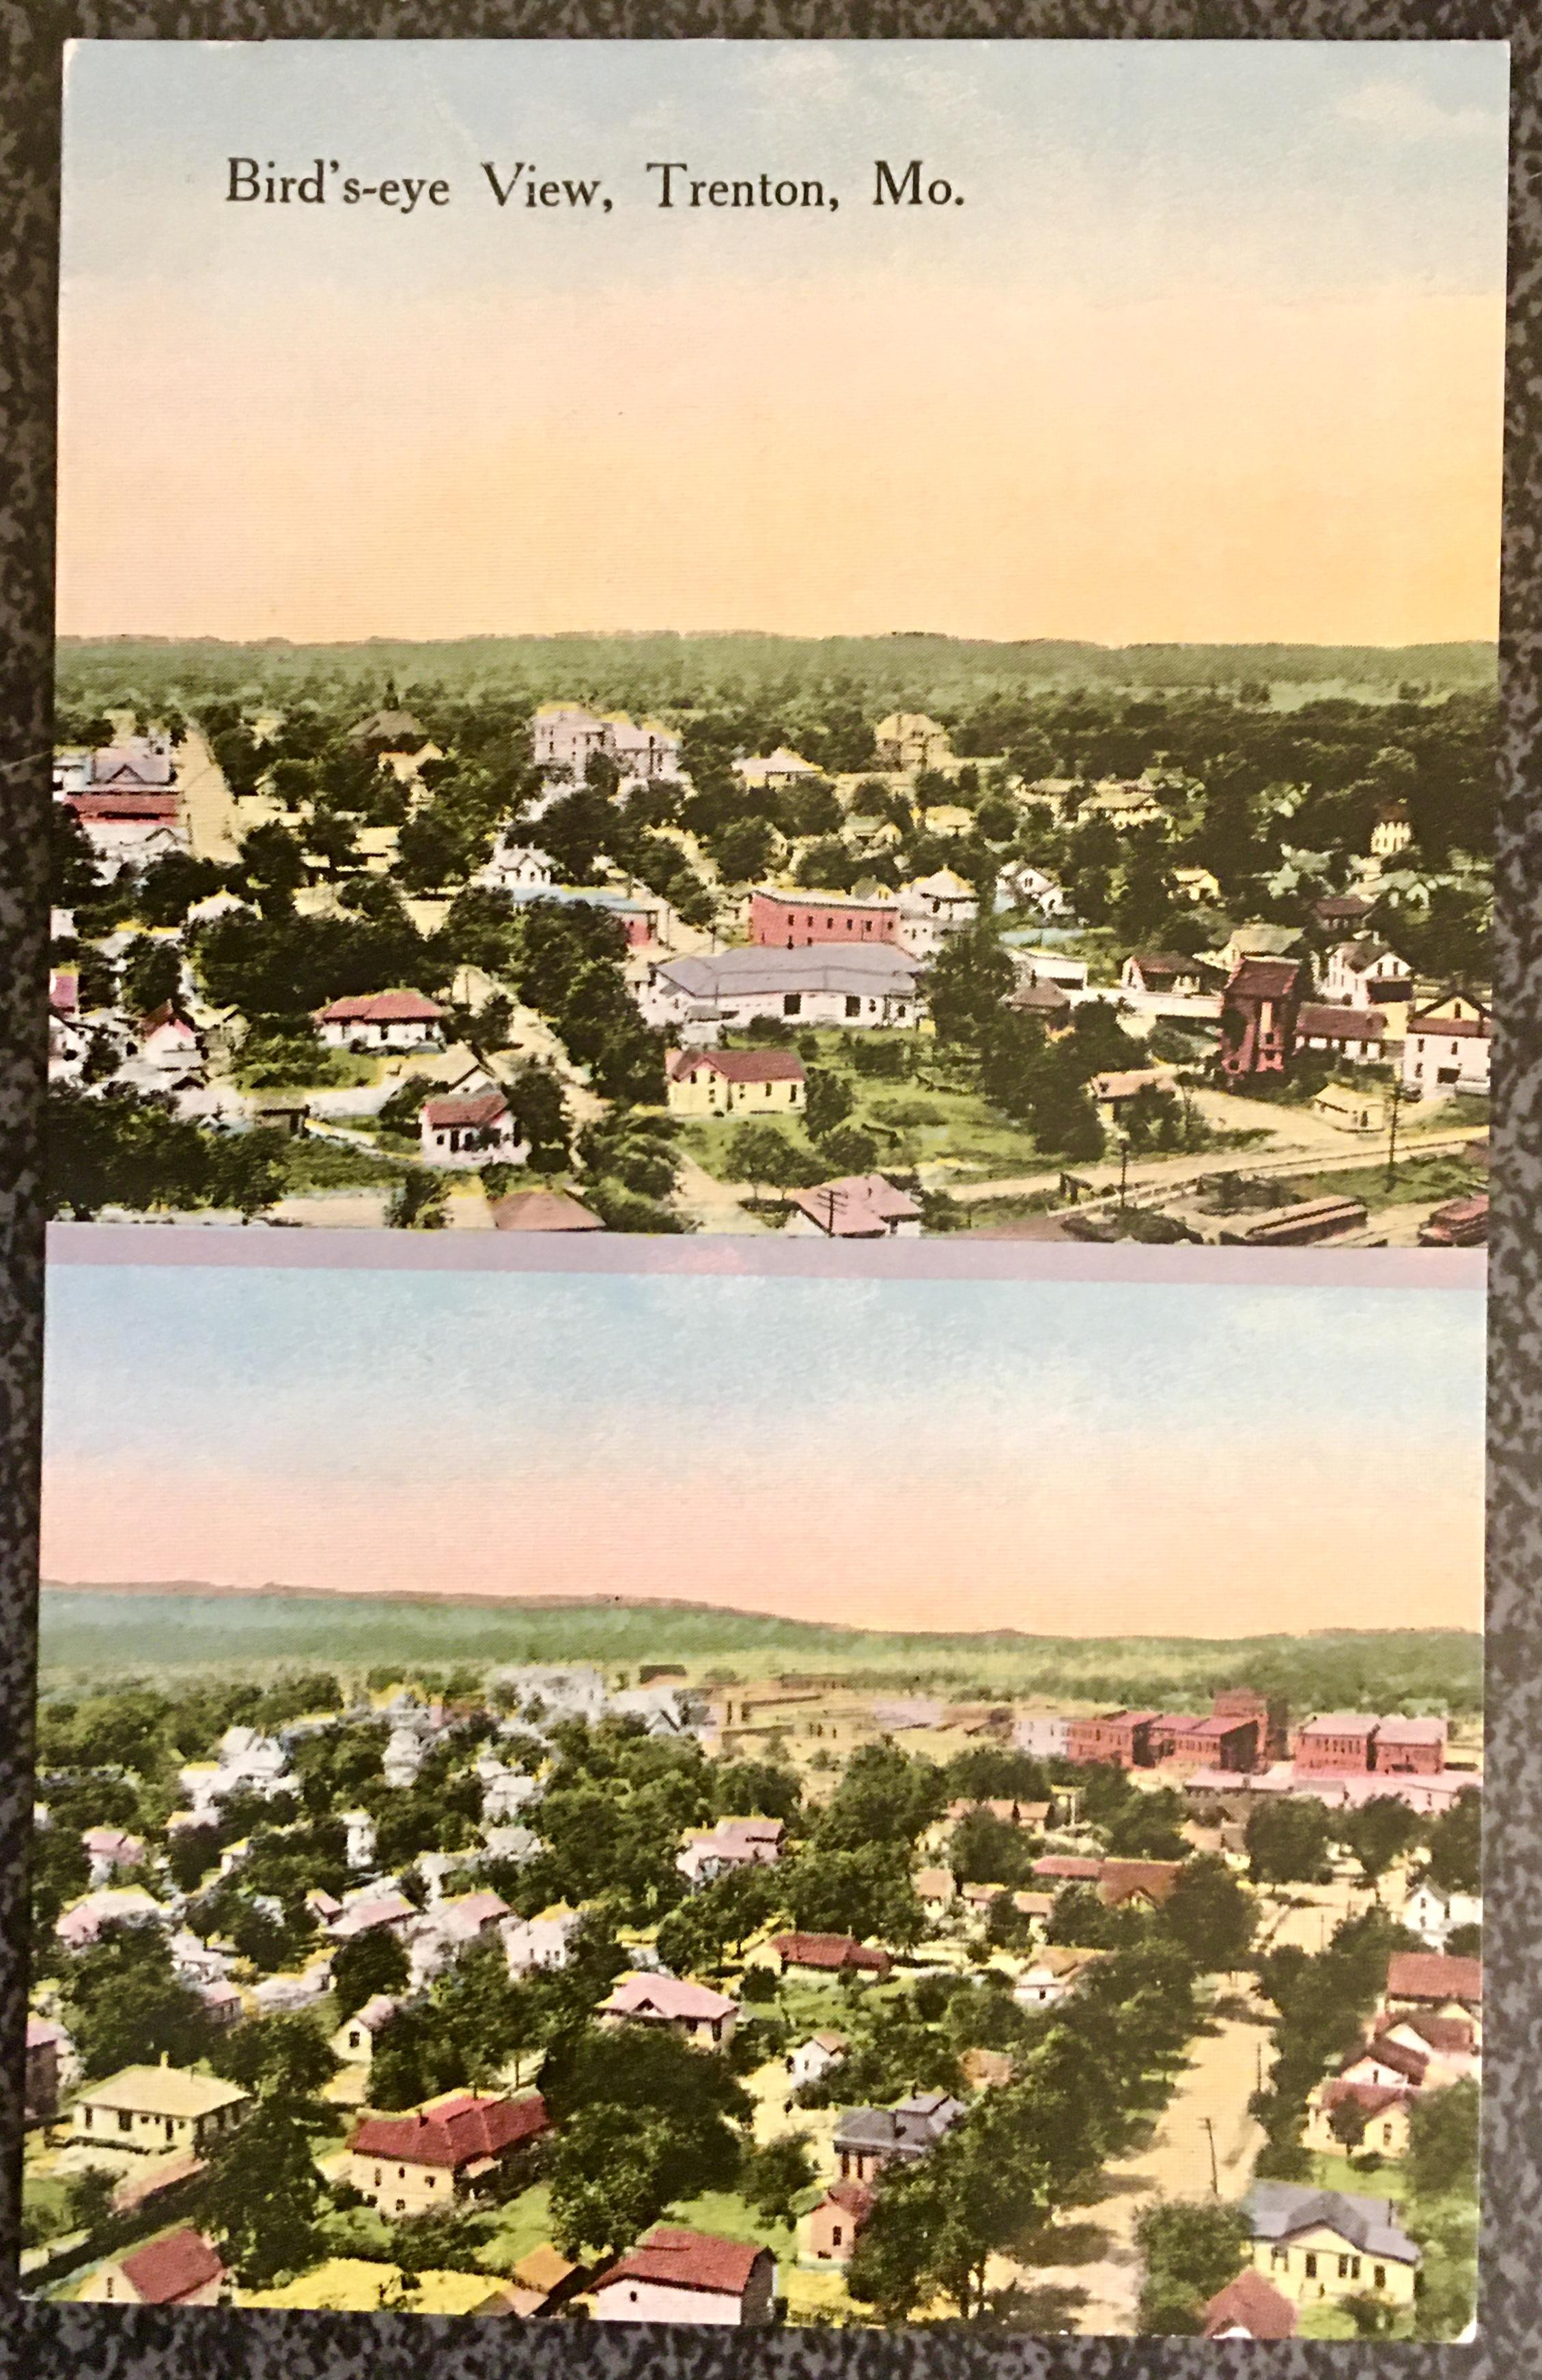 1910-TrentonBirdsEyeViewPC